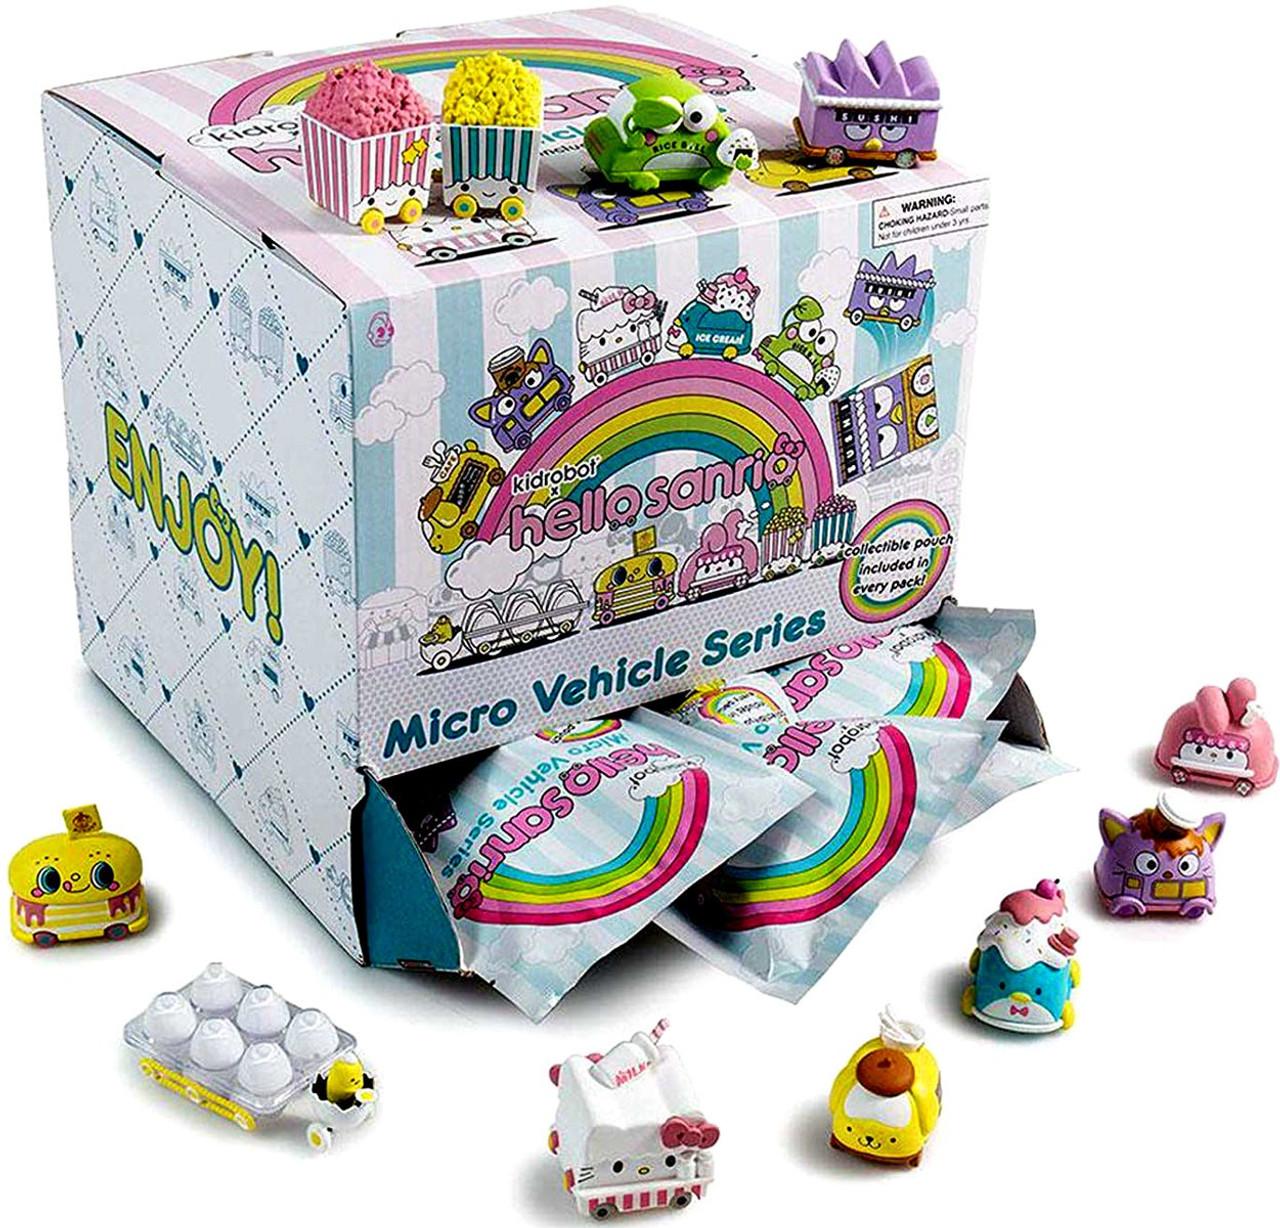 Micro Vehicle Series Hello Sanrio Mystery Box [24 Packs]